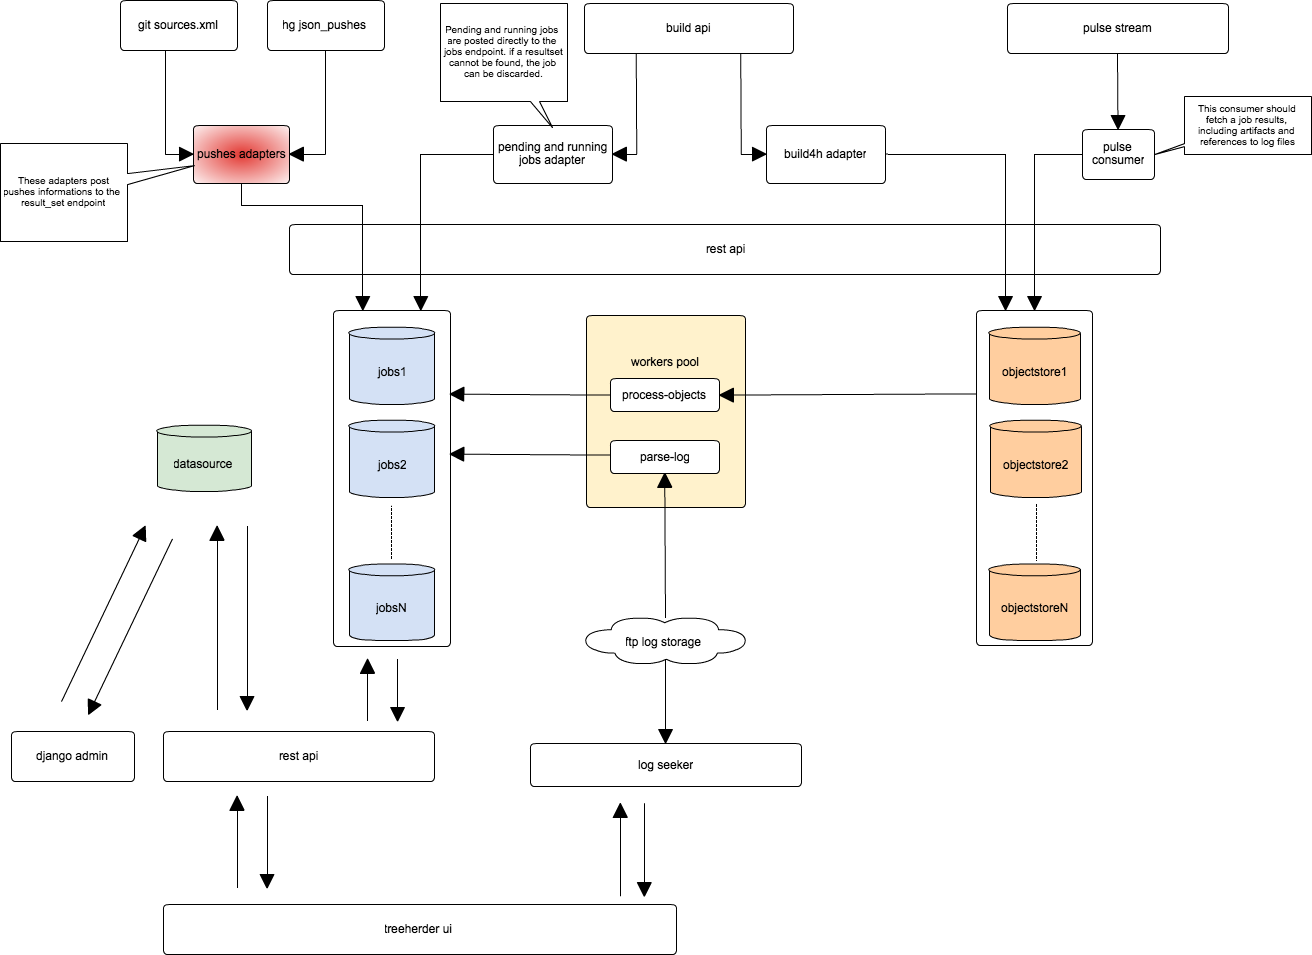 https://cacoo.com/diagrams/870thliGfT89pLZc-B5E80.png